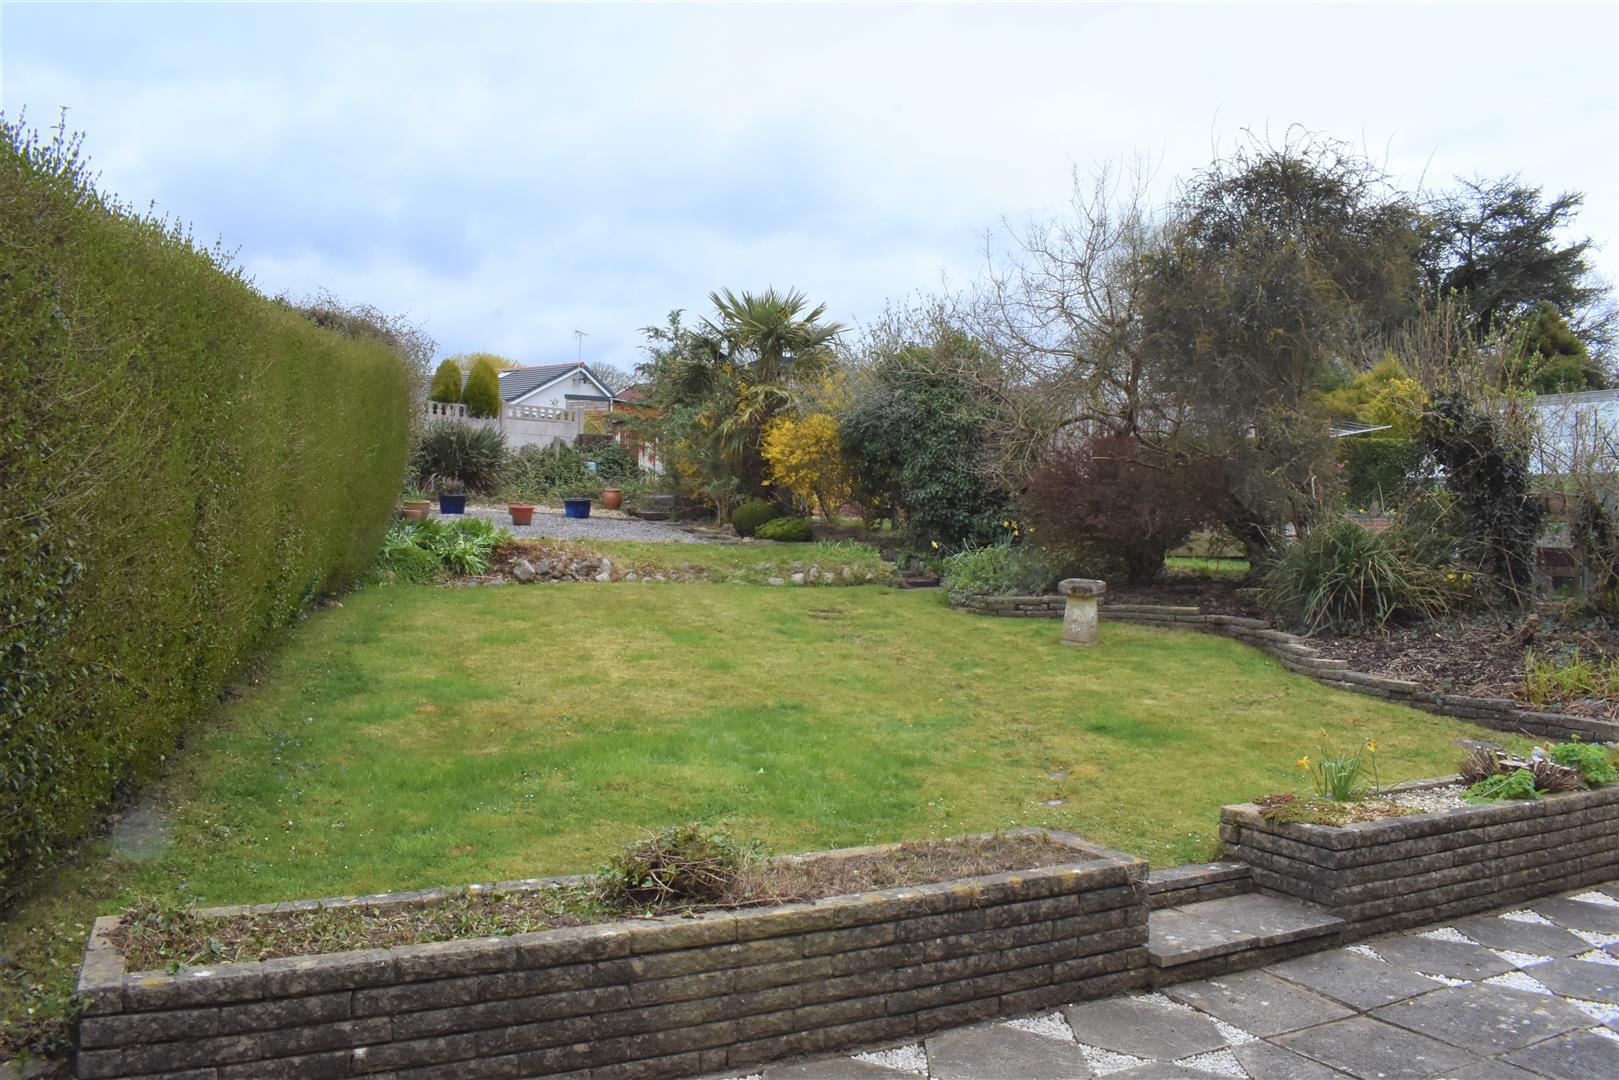 Saunders Way, Derwen Fawr, Swansea, SA2 8BH